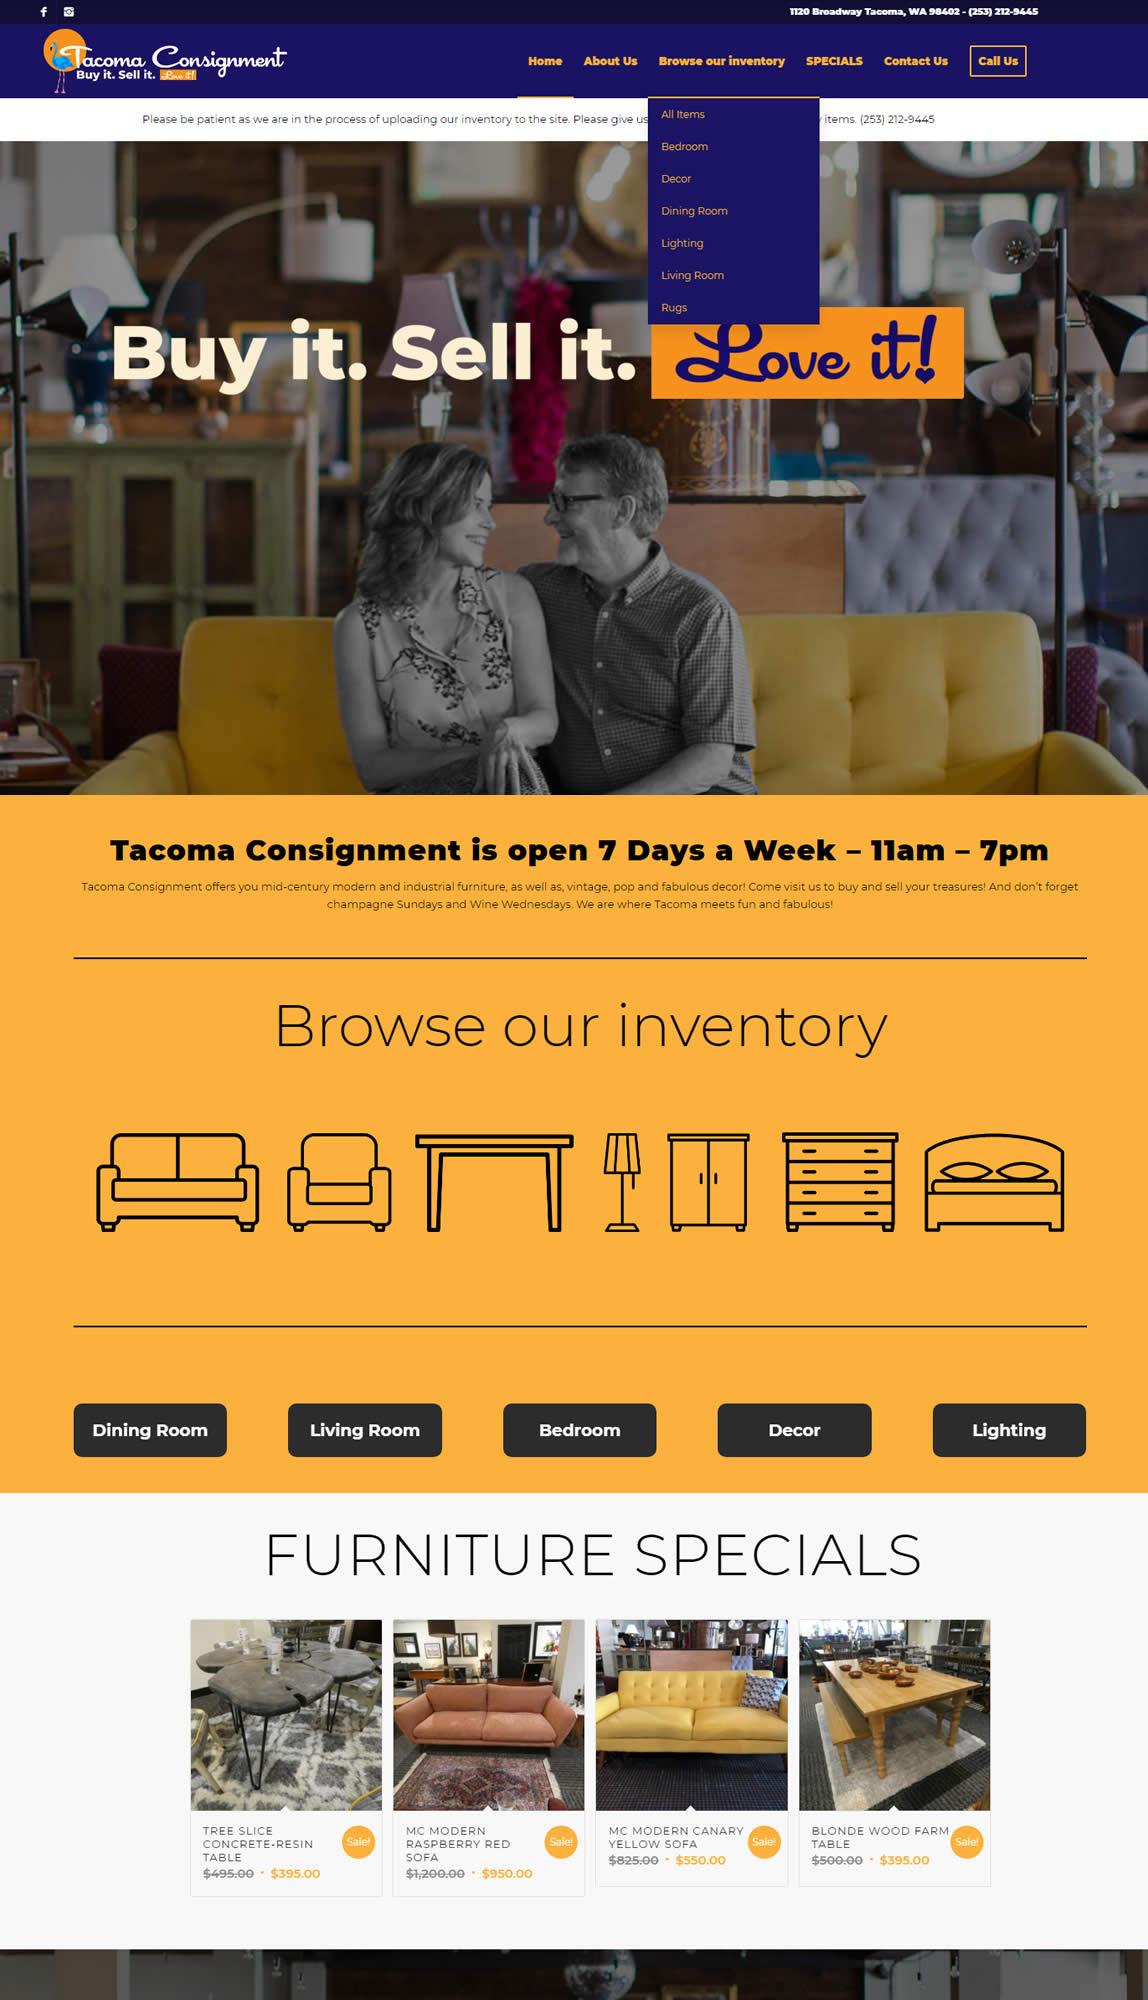 Tacoma Web Design Home Page for Tacoma Consignment - Tacoma Web Design Project